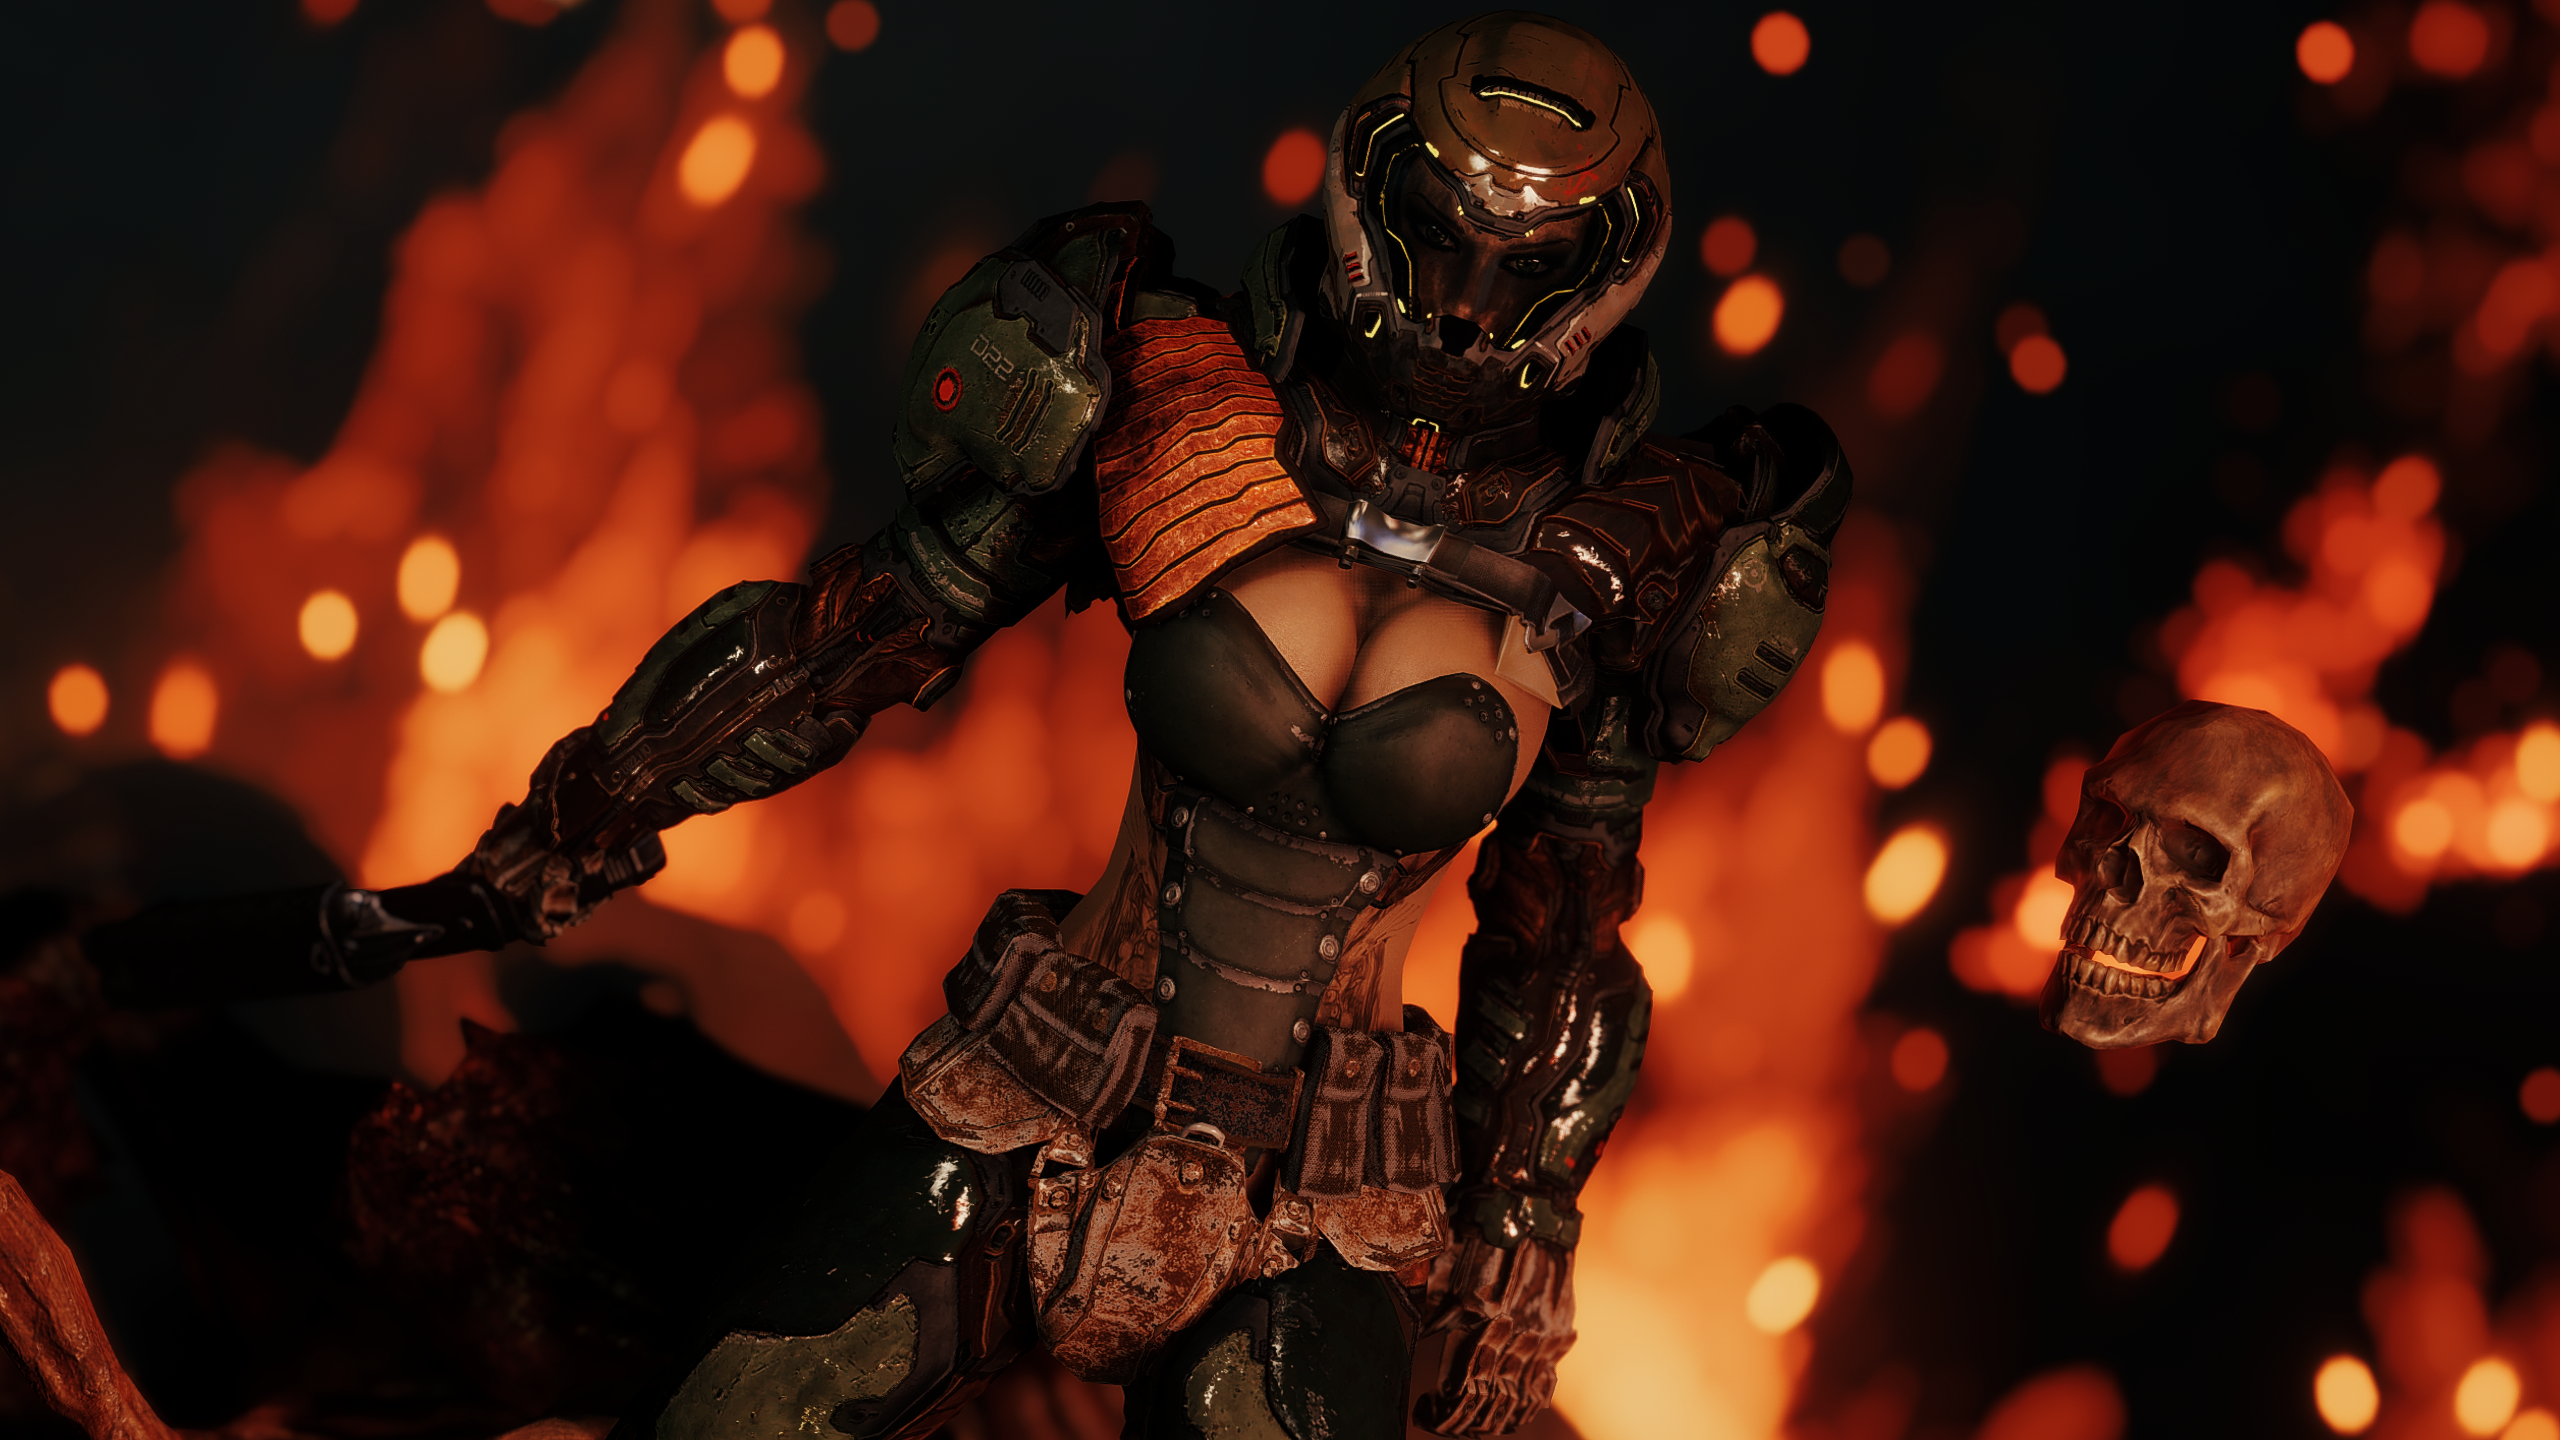 Doom Guy Wallpaper Posted By Samantha Mercado